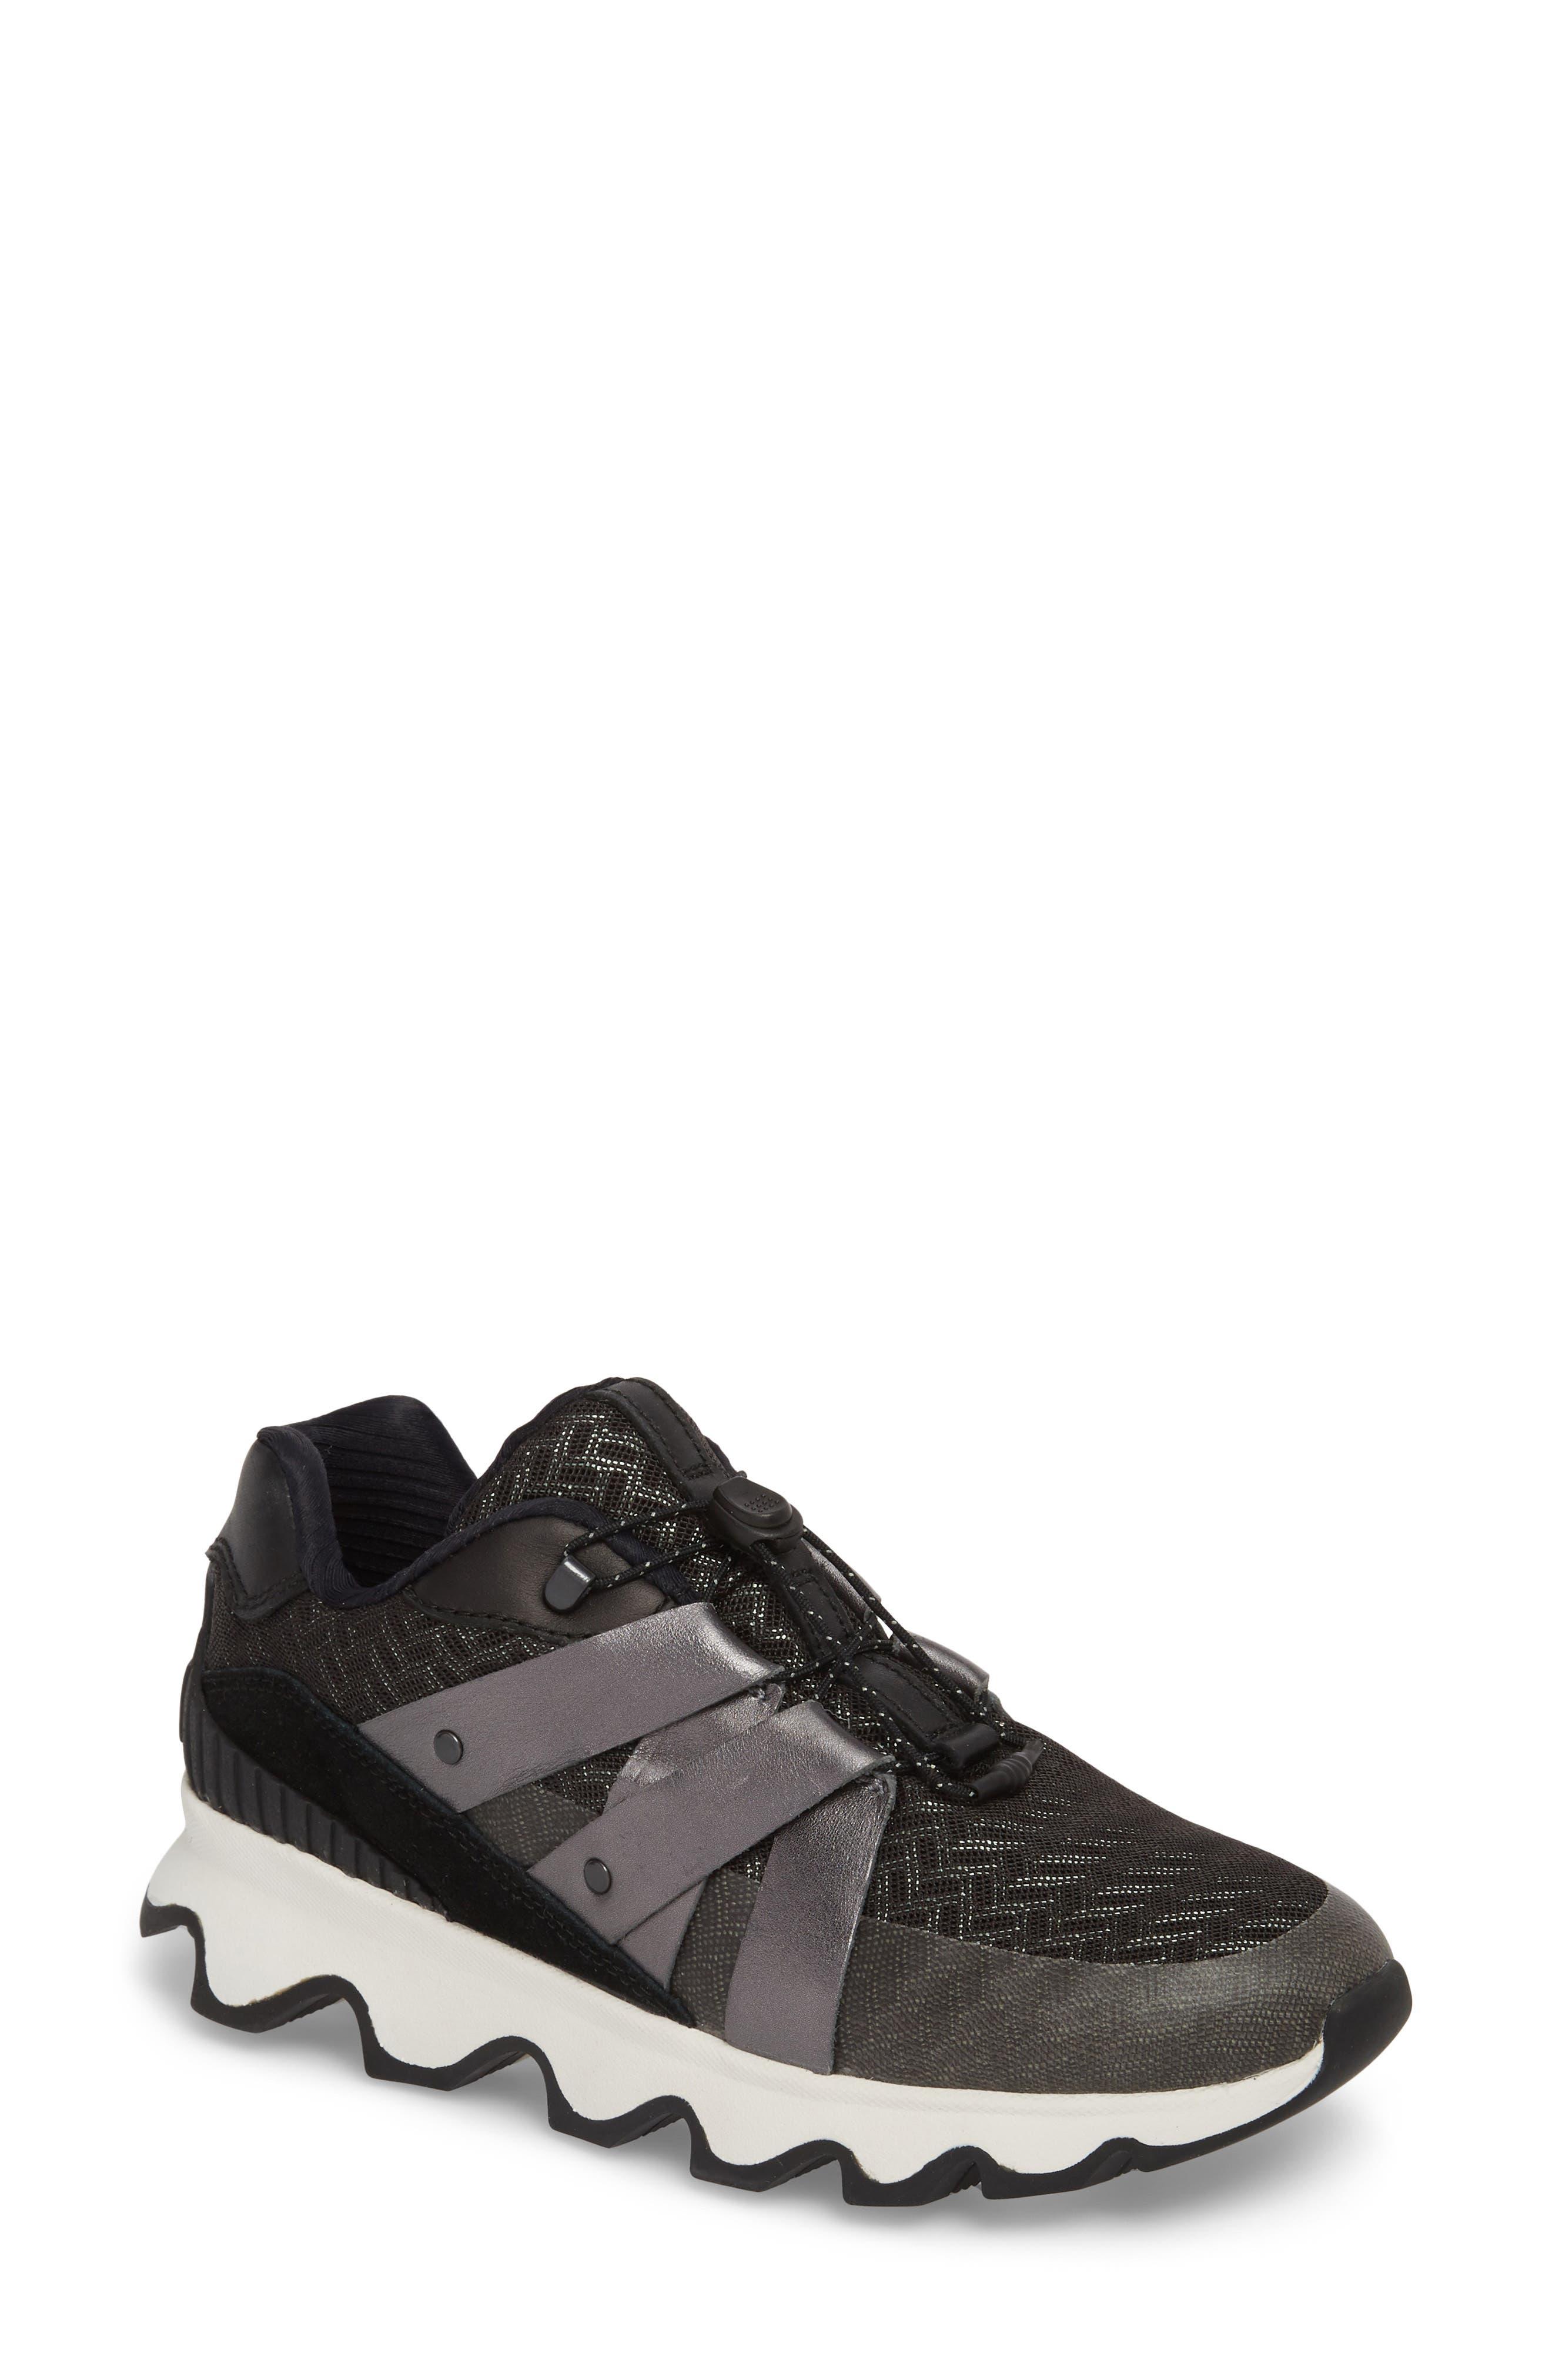 Kinetic Speed Sneaker,                         Main,                         color, 010